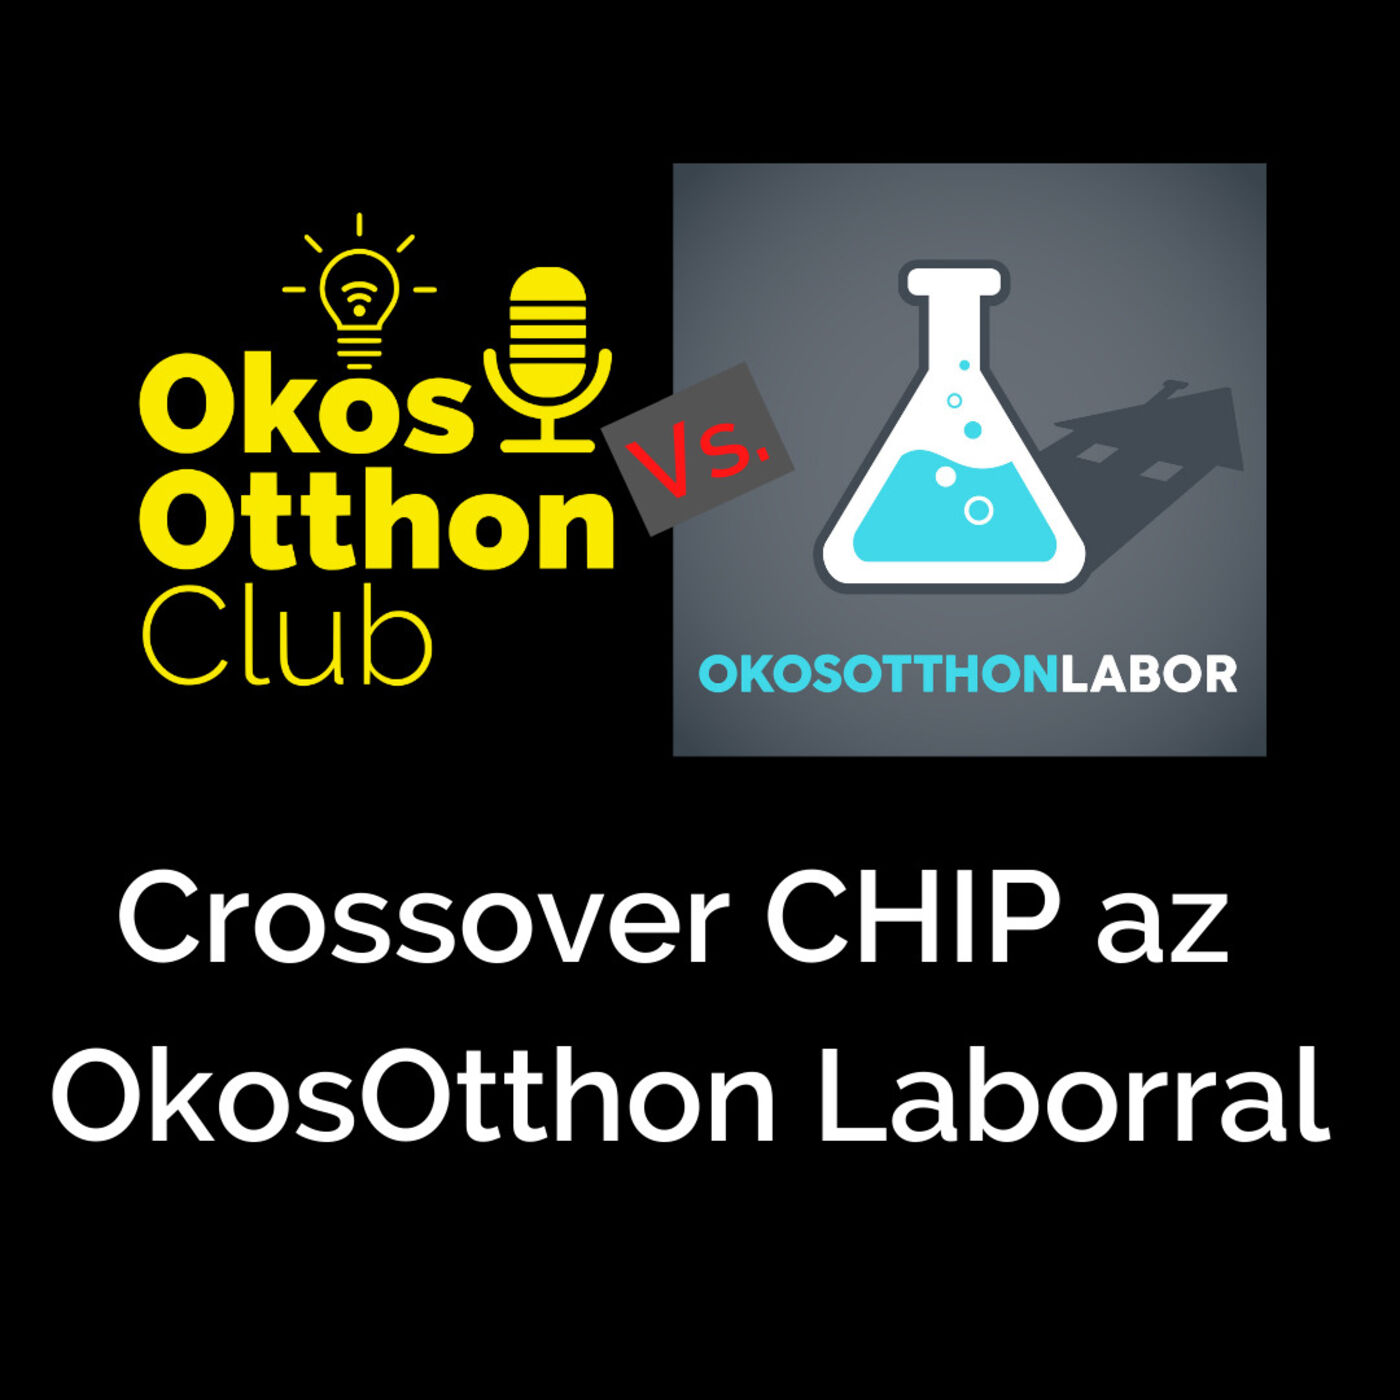 Crossover CHIP az Okos Otthon Laborral